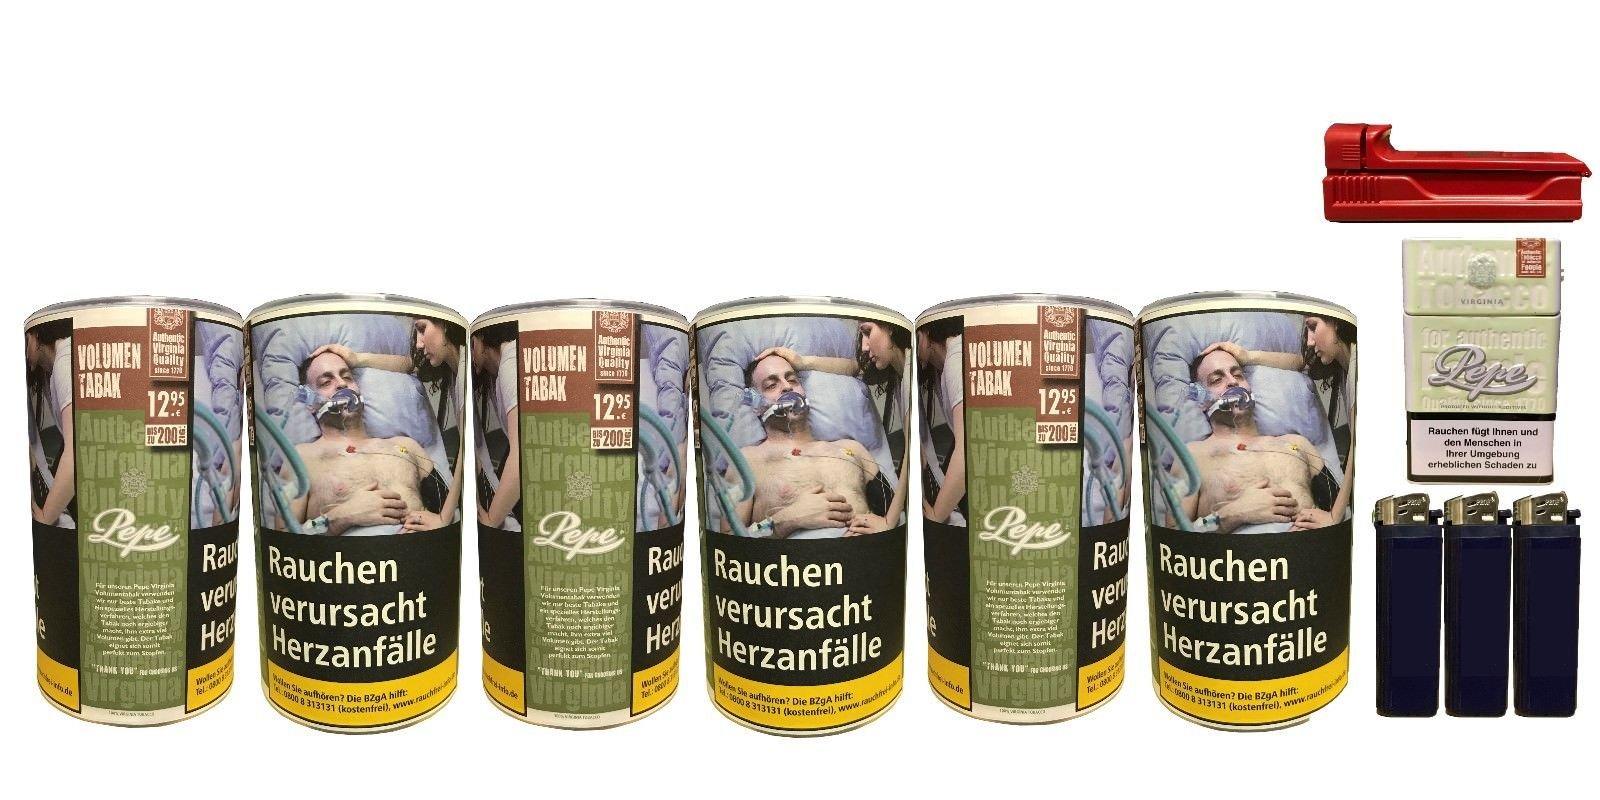 6x Pepe Rich Green Tabak / Volumentabak 85g + Feuerzeuge, Zigarettenbox, Stopfer